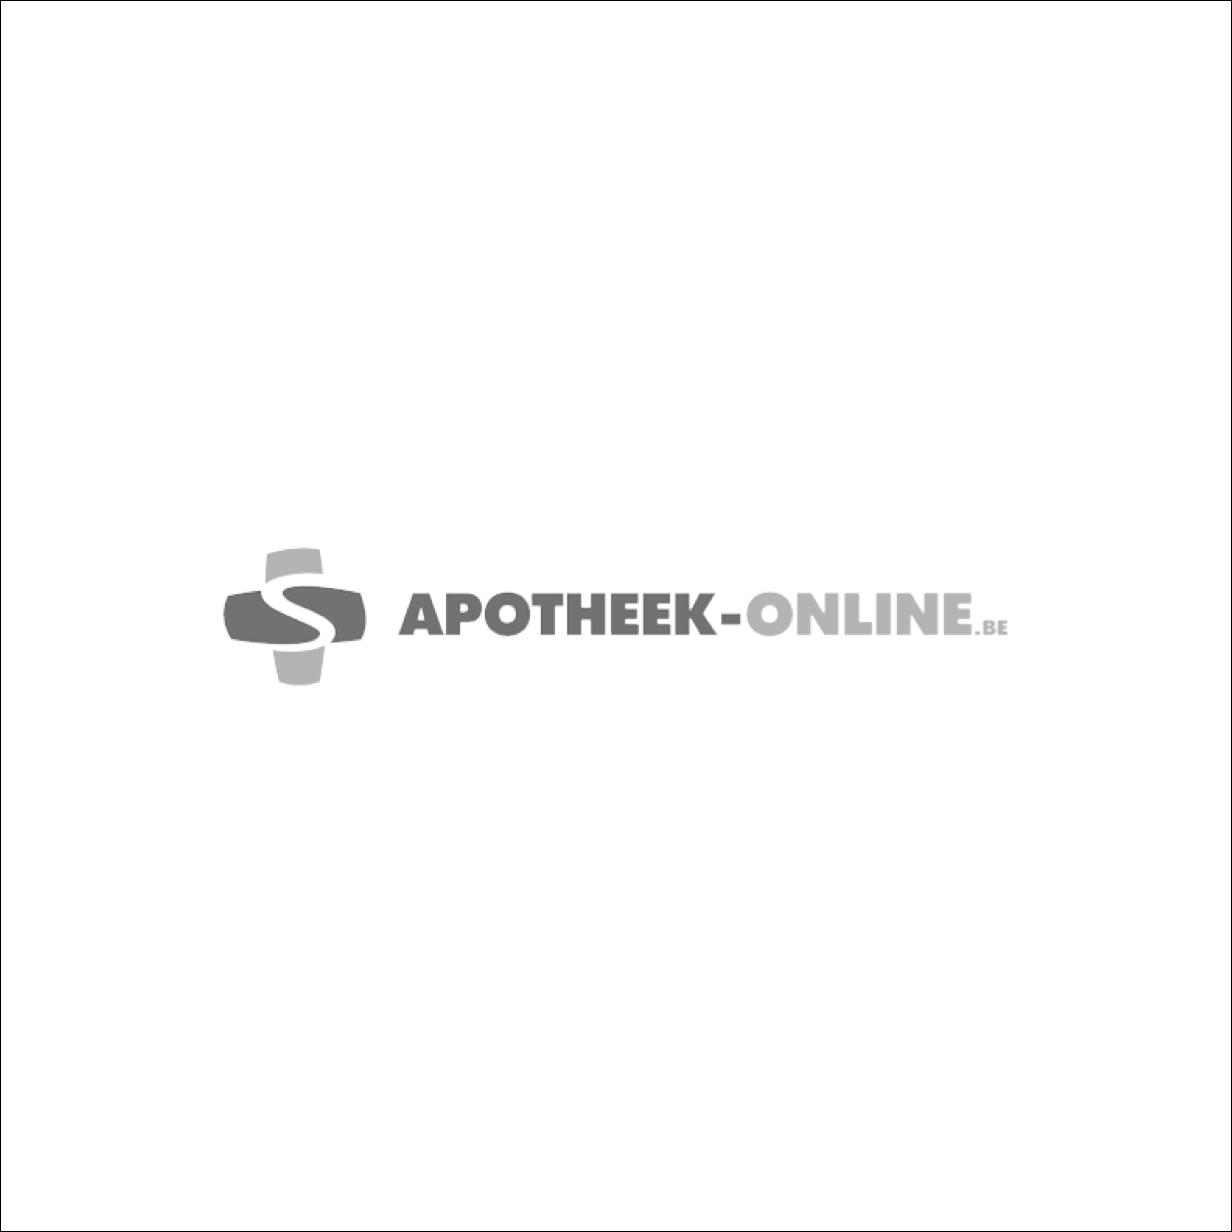 MOLLELAST HAFT BANDE ELAST ADH 10CMX20M 30071